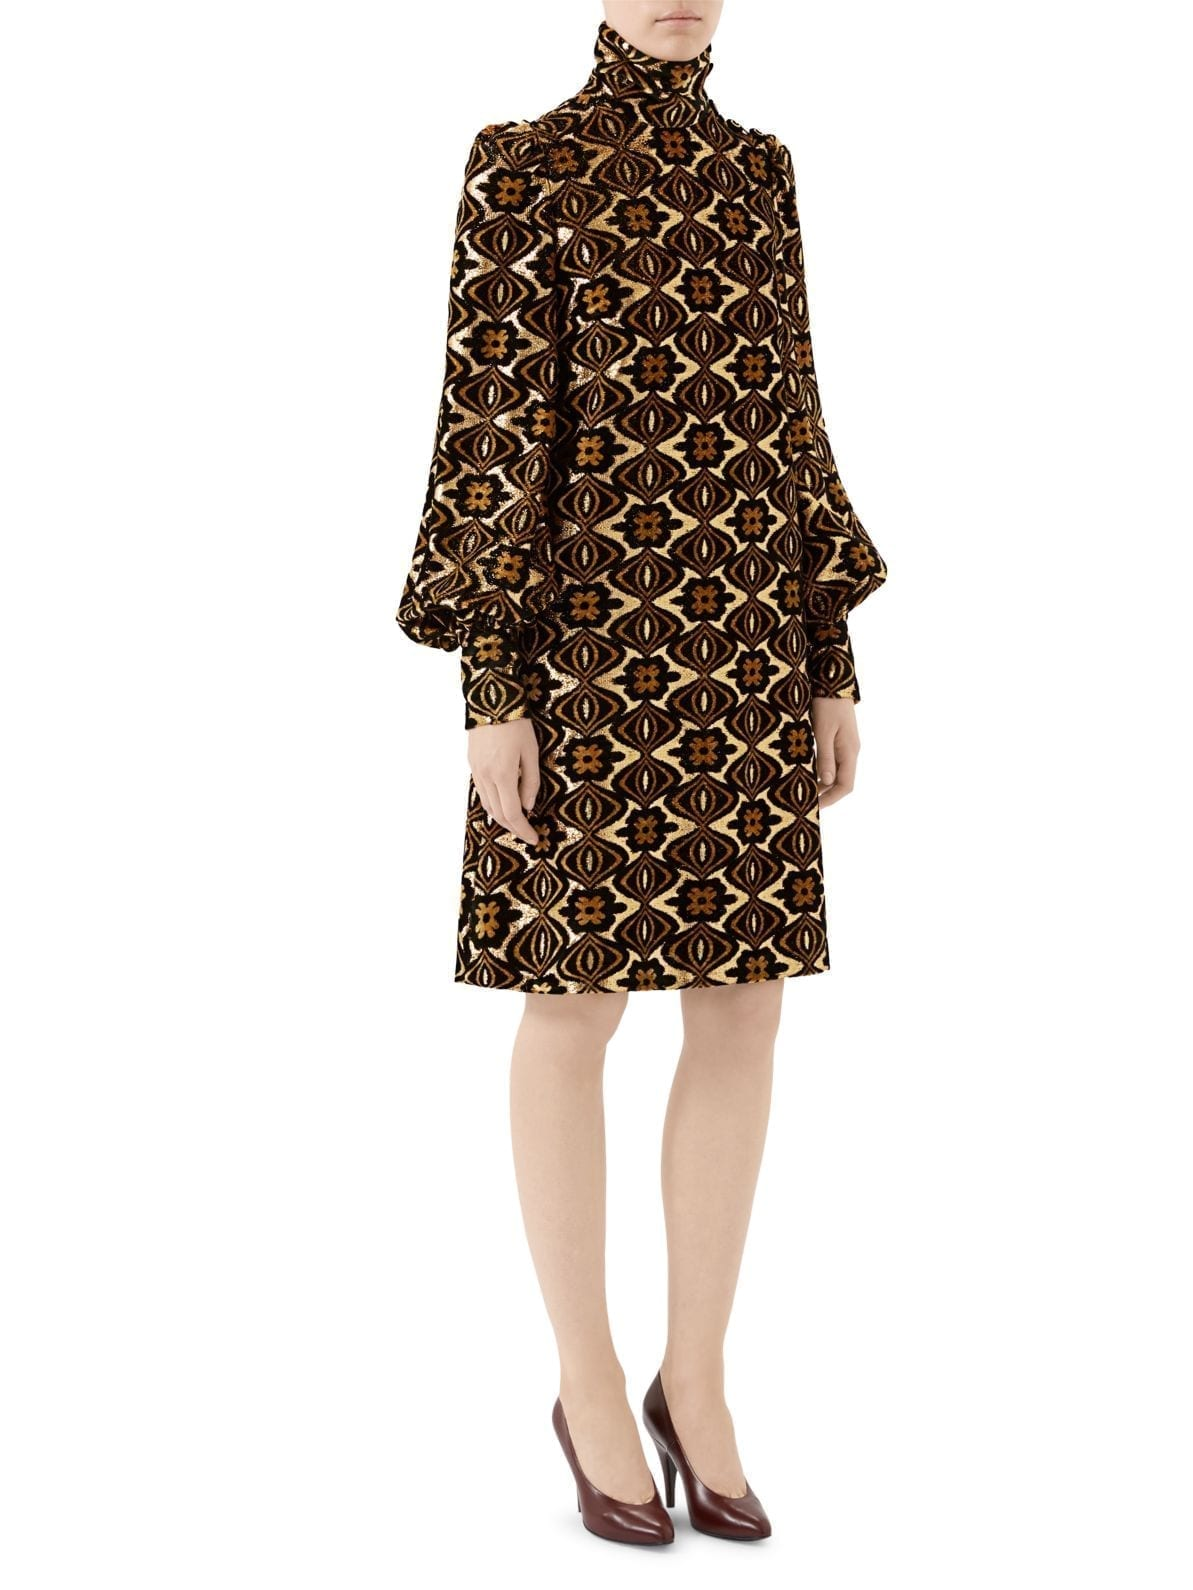 GUCCI Lamé Jacquard Long-Sleeve Turtleneck Shift Cocktail Dress